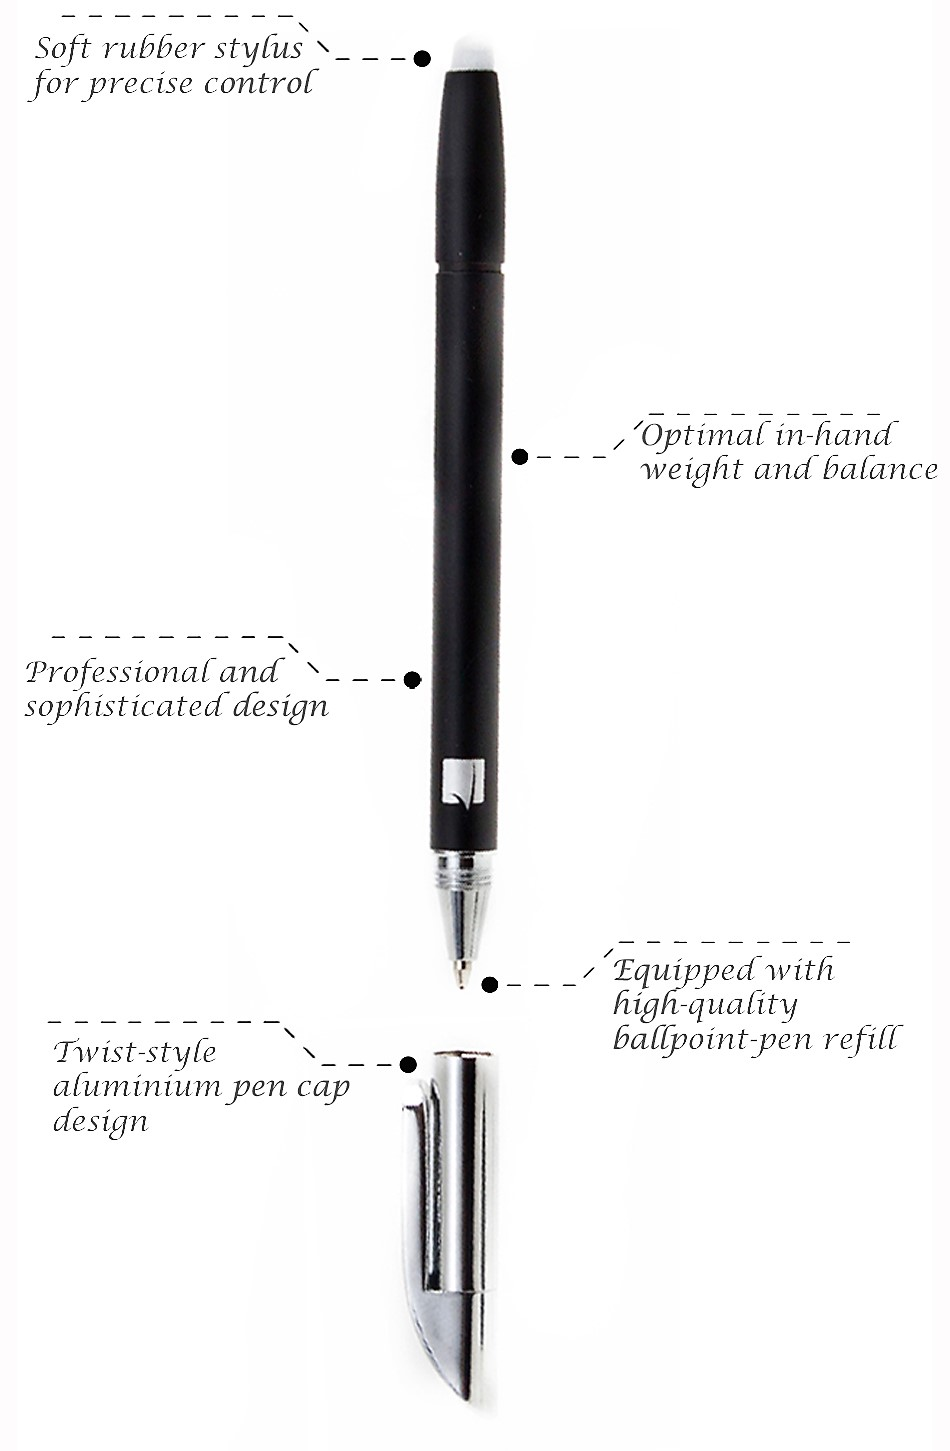 GreatShield EX Series 2 in 1 Ballpoint Pen + Capacitive